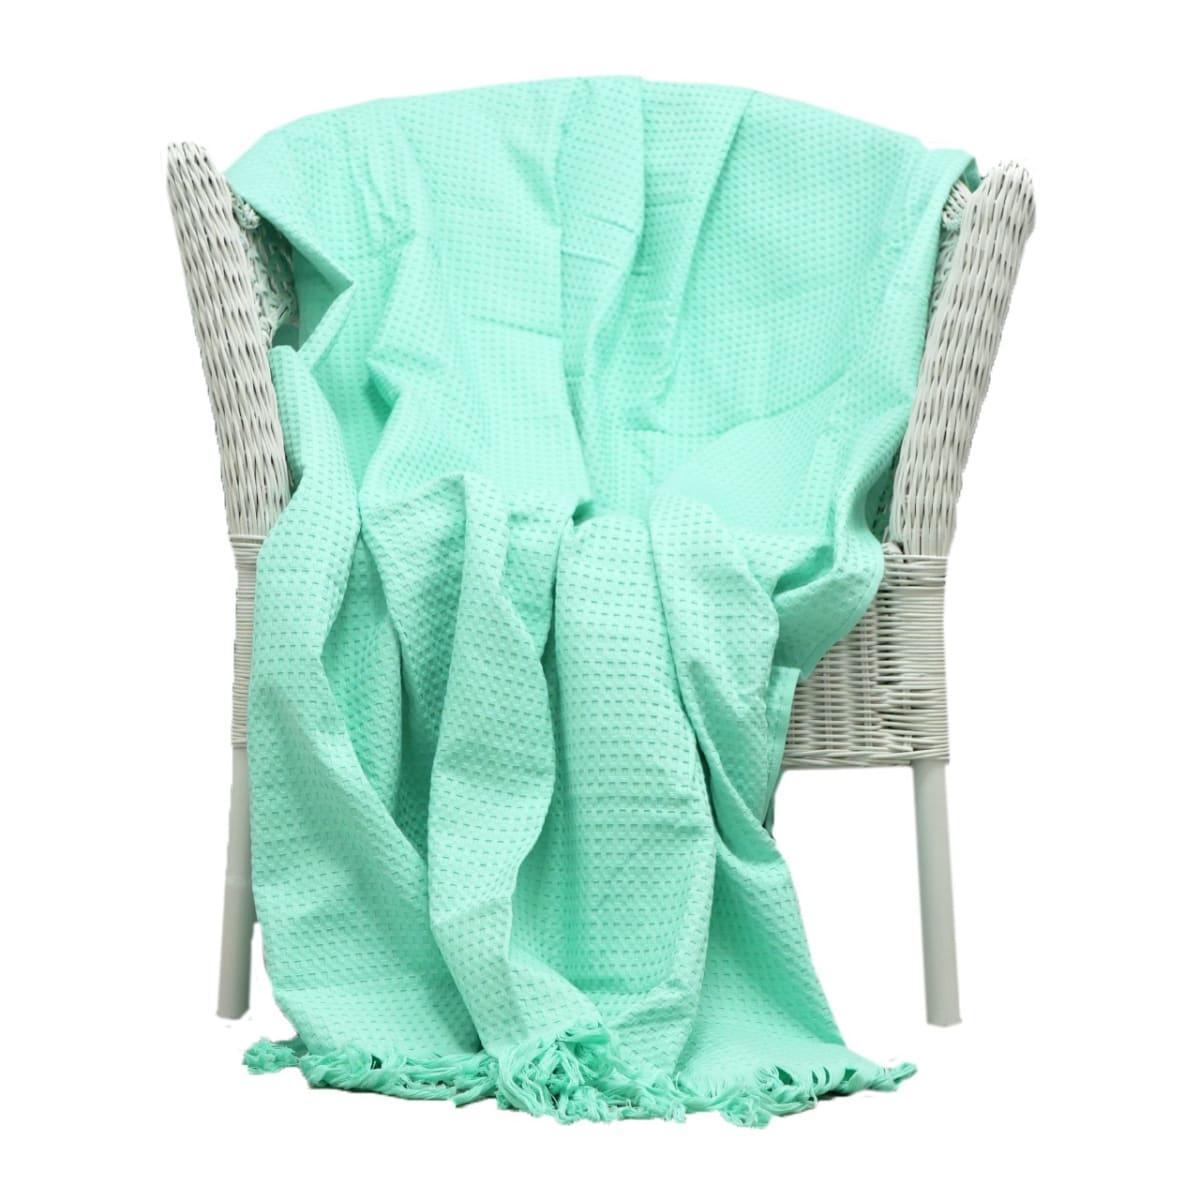 Плед Belezza Сахара 150х200см, вафельная ткань